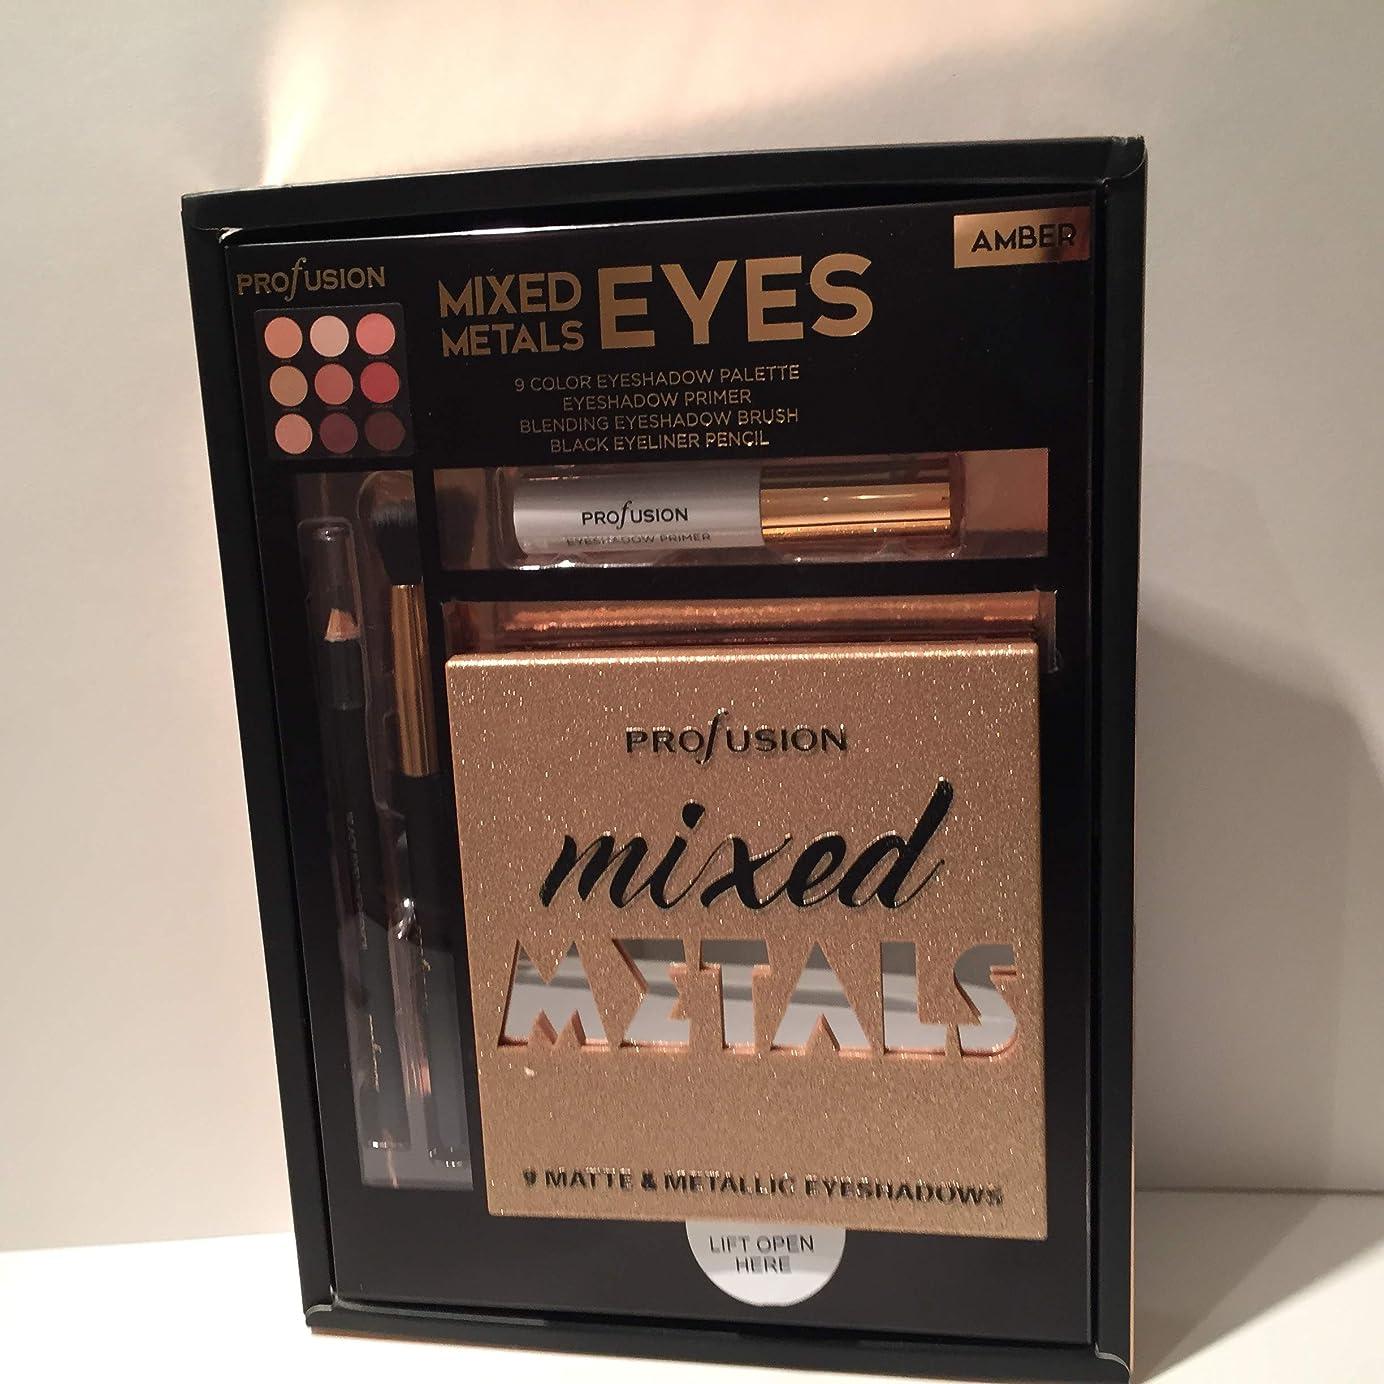 PROFUSION Mixed Metals & Eyes Palette - Amber (並行輸入品)